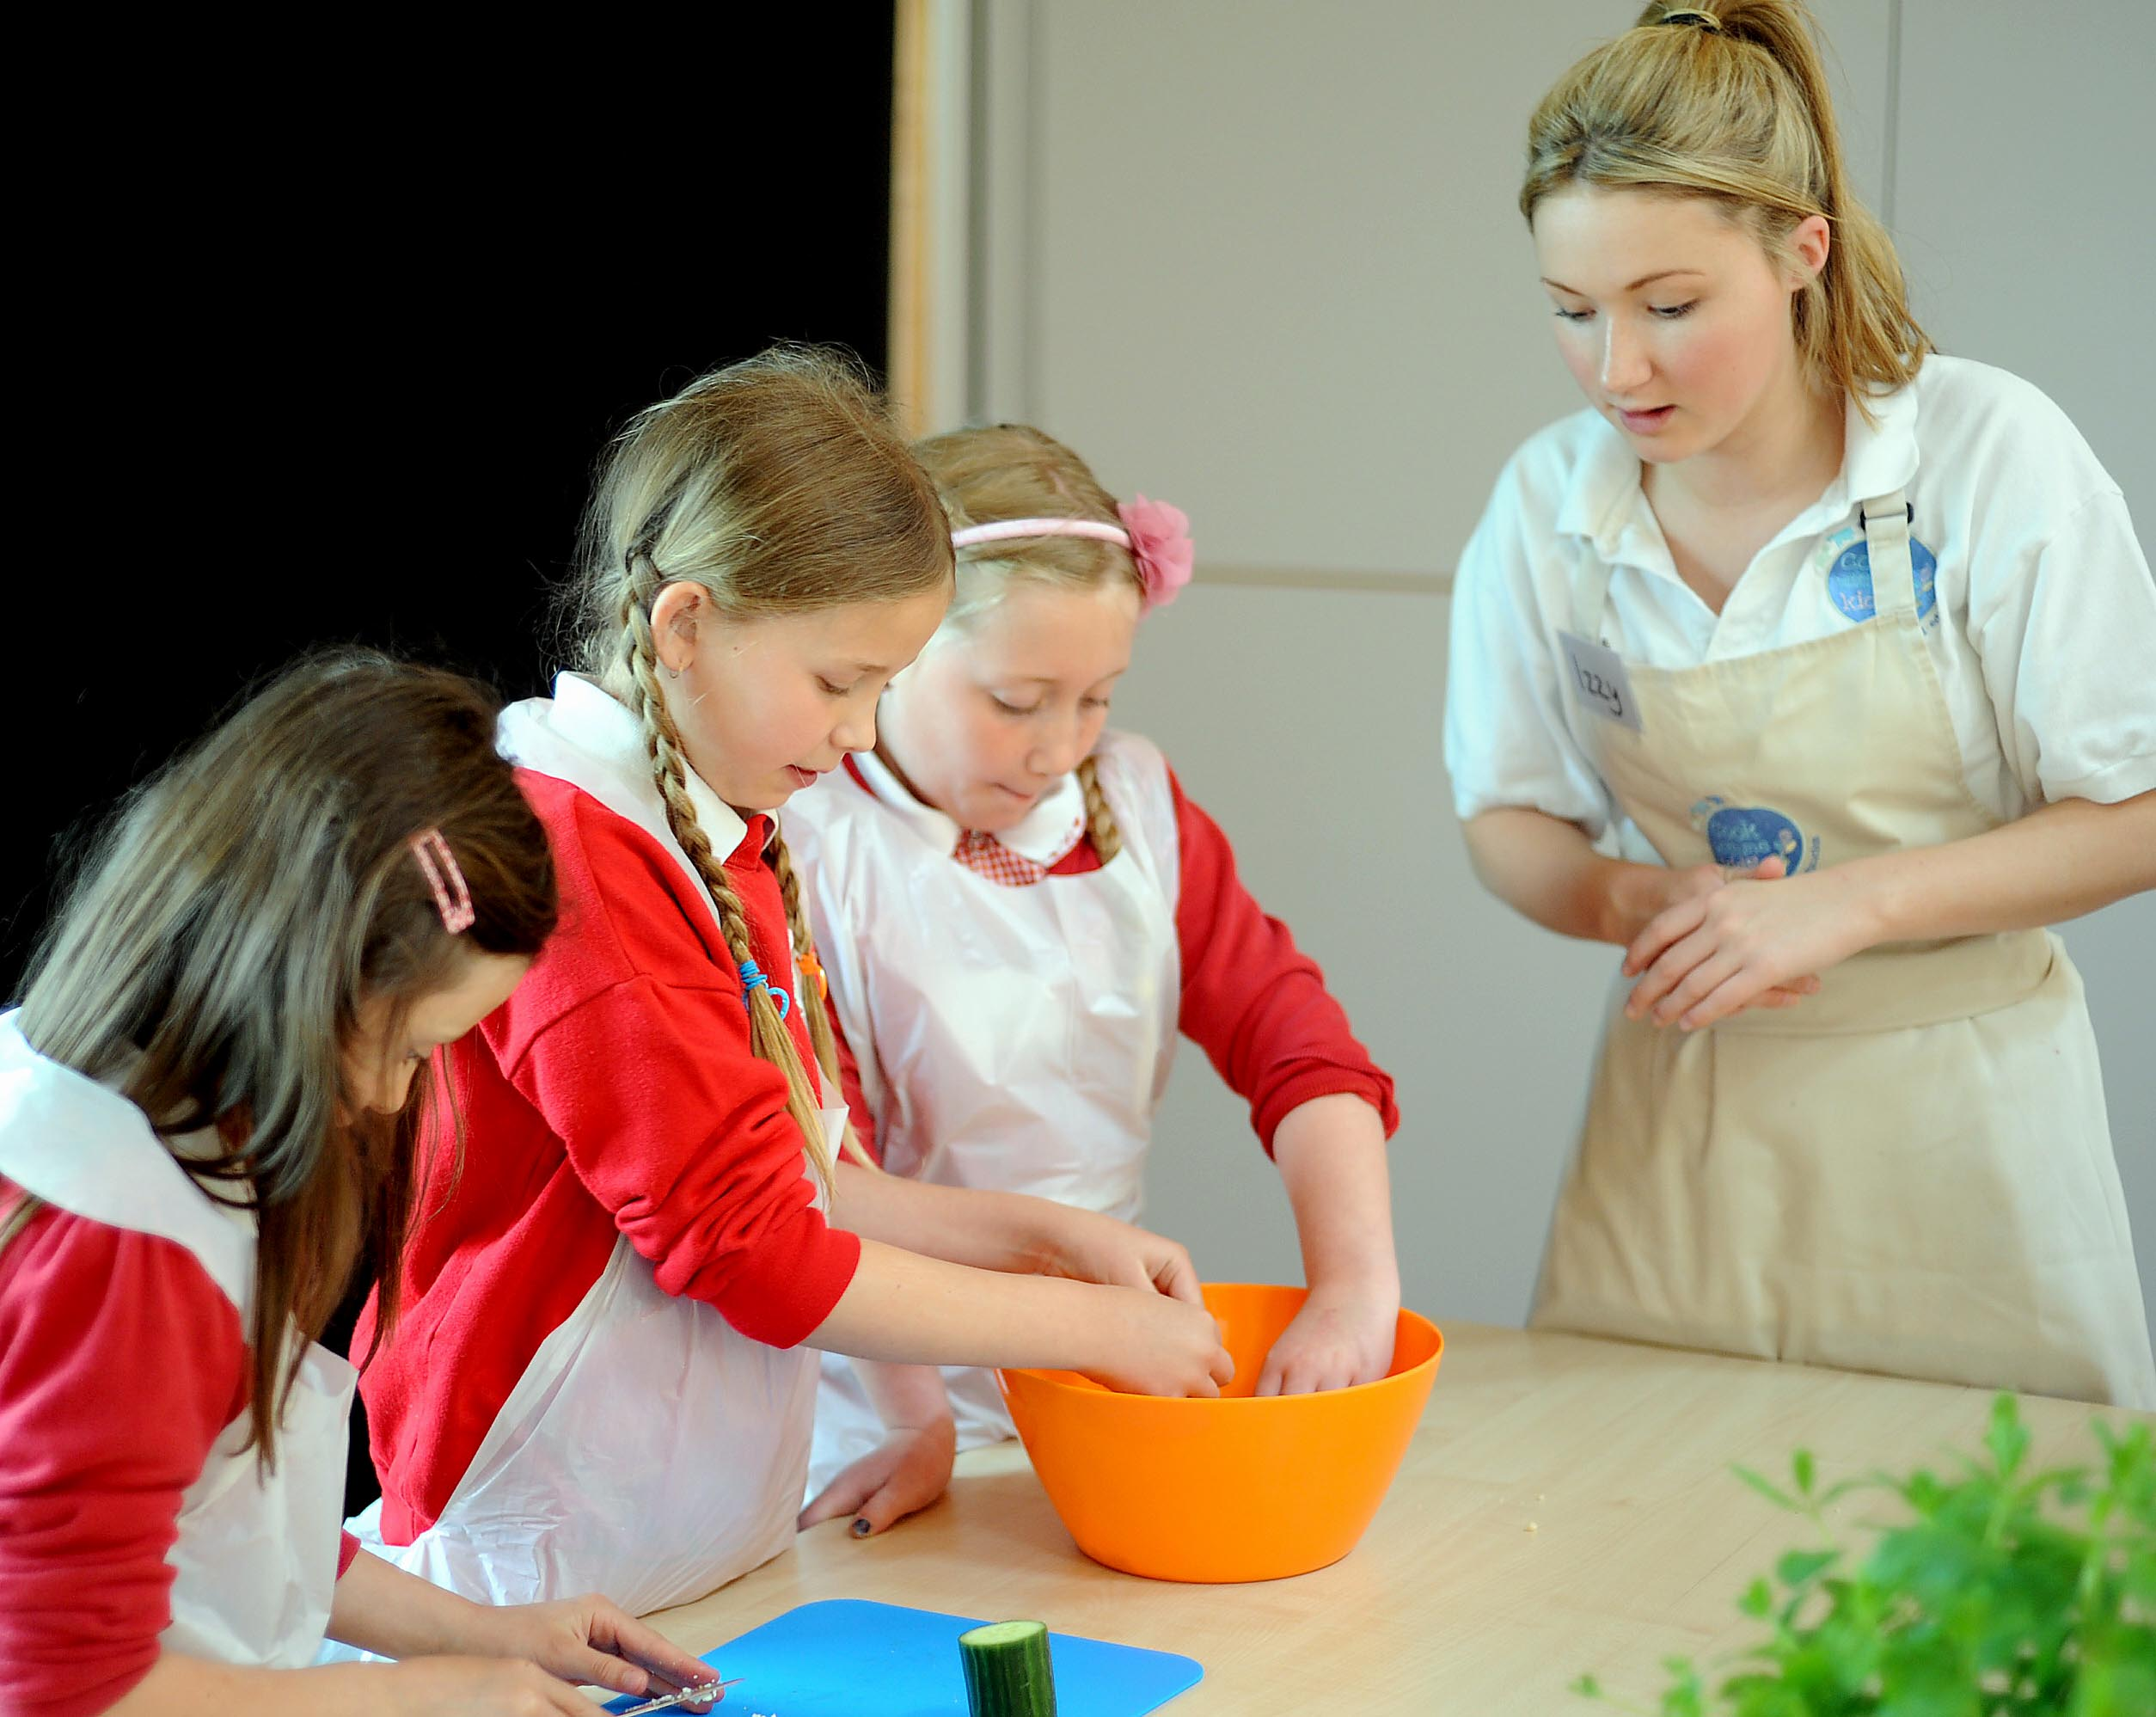 Anglian Food Education Plan And Drink Crowdfunding